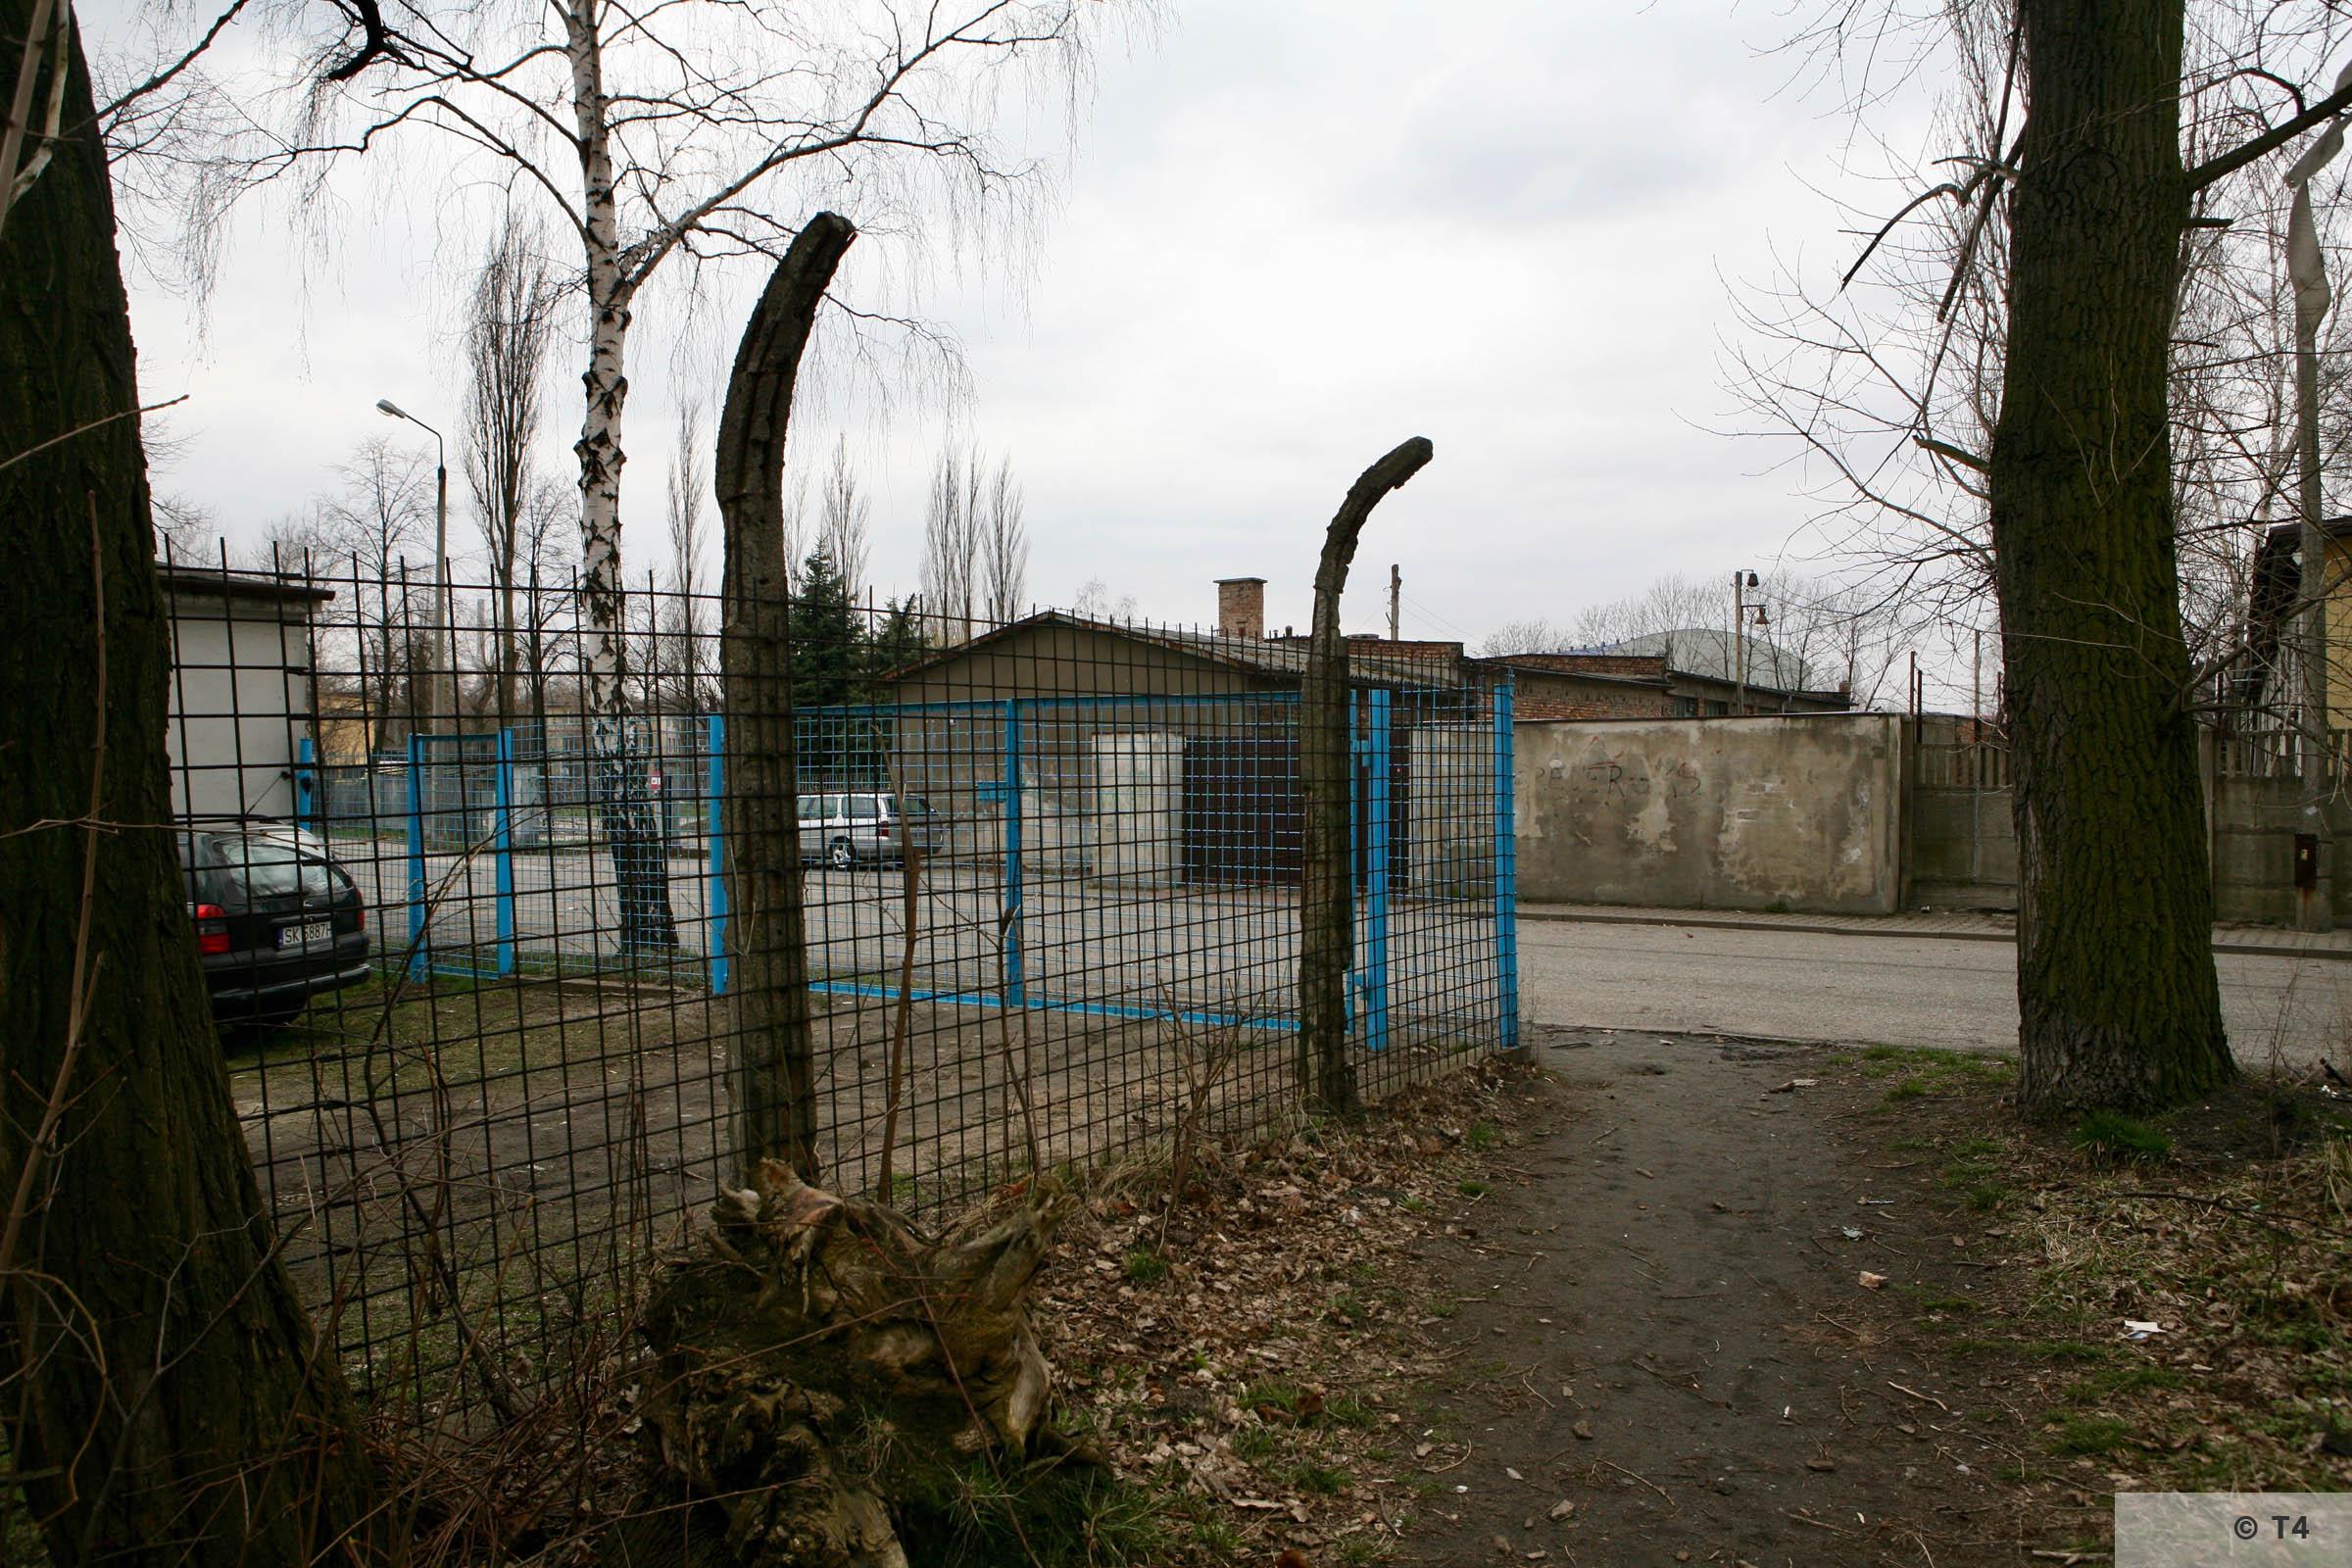 Area of main entrance gate. 2007 T4 6174